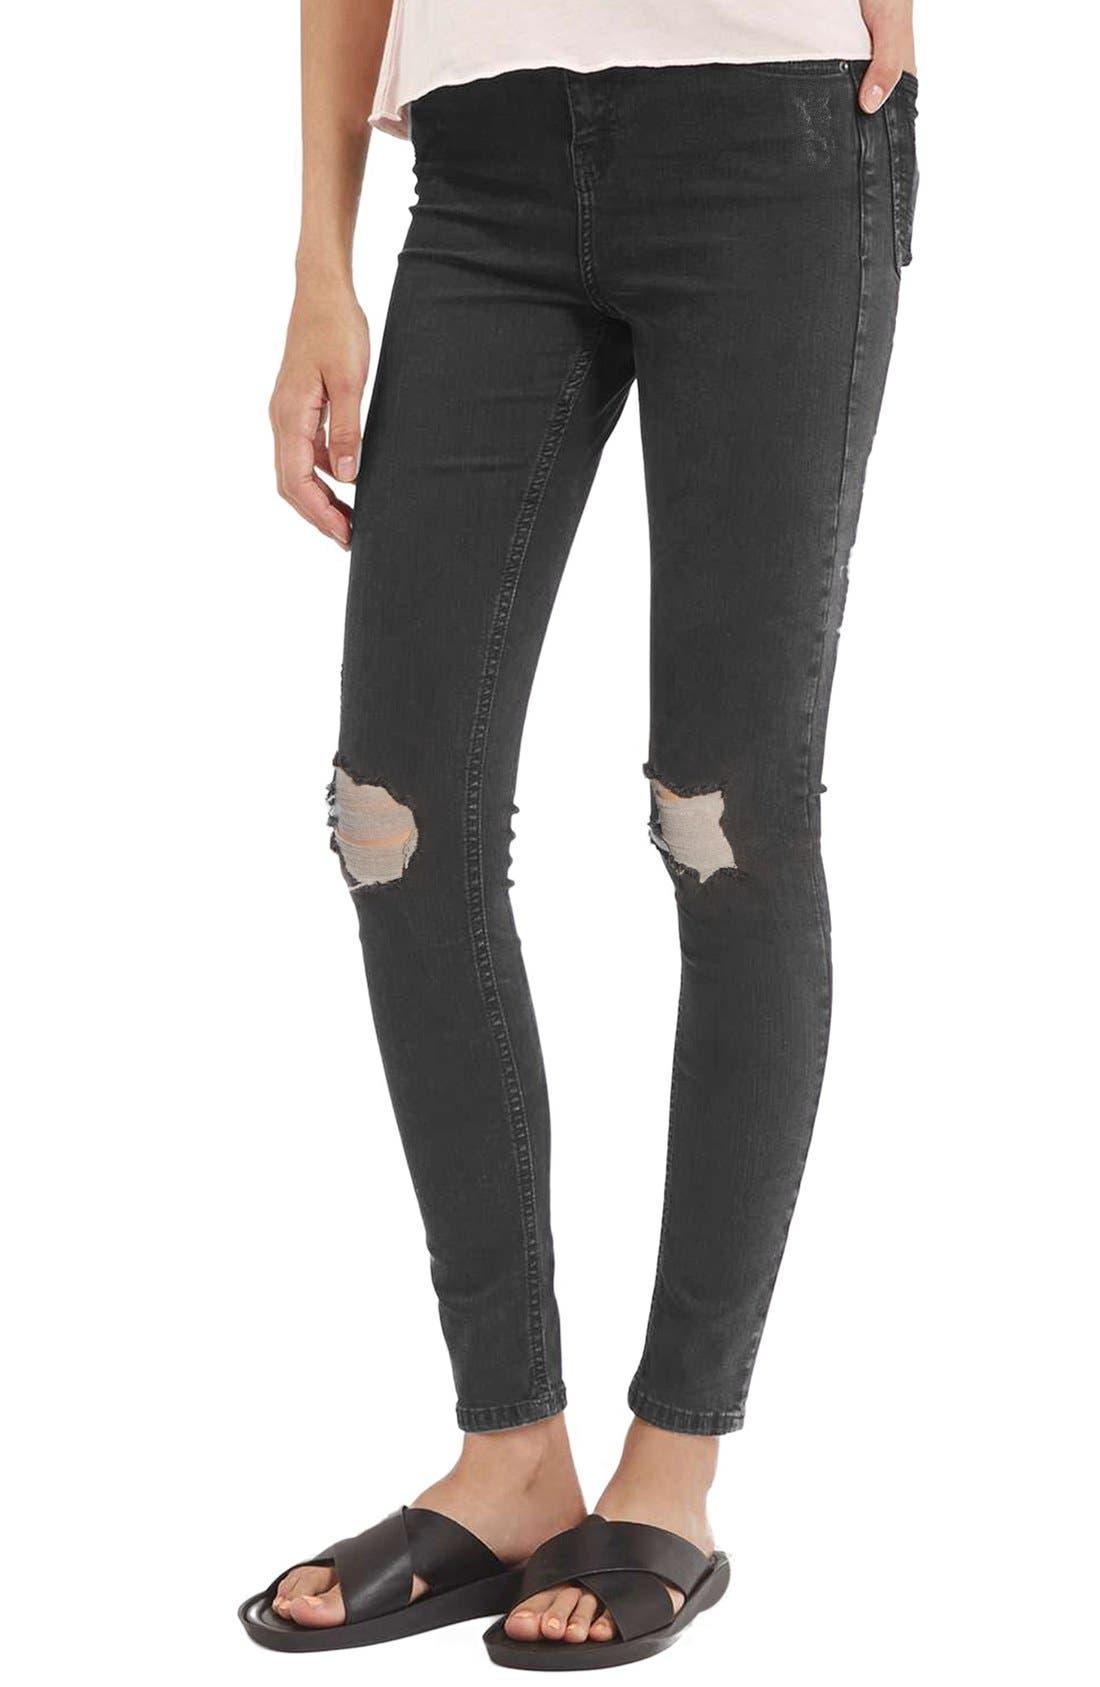 Jamie Shredded High Waist Skinny Jeans,                         Main,                         color, 001